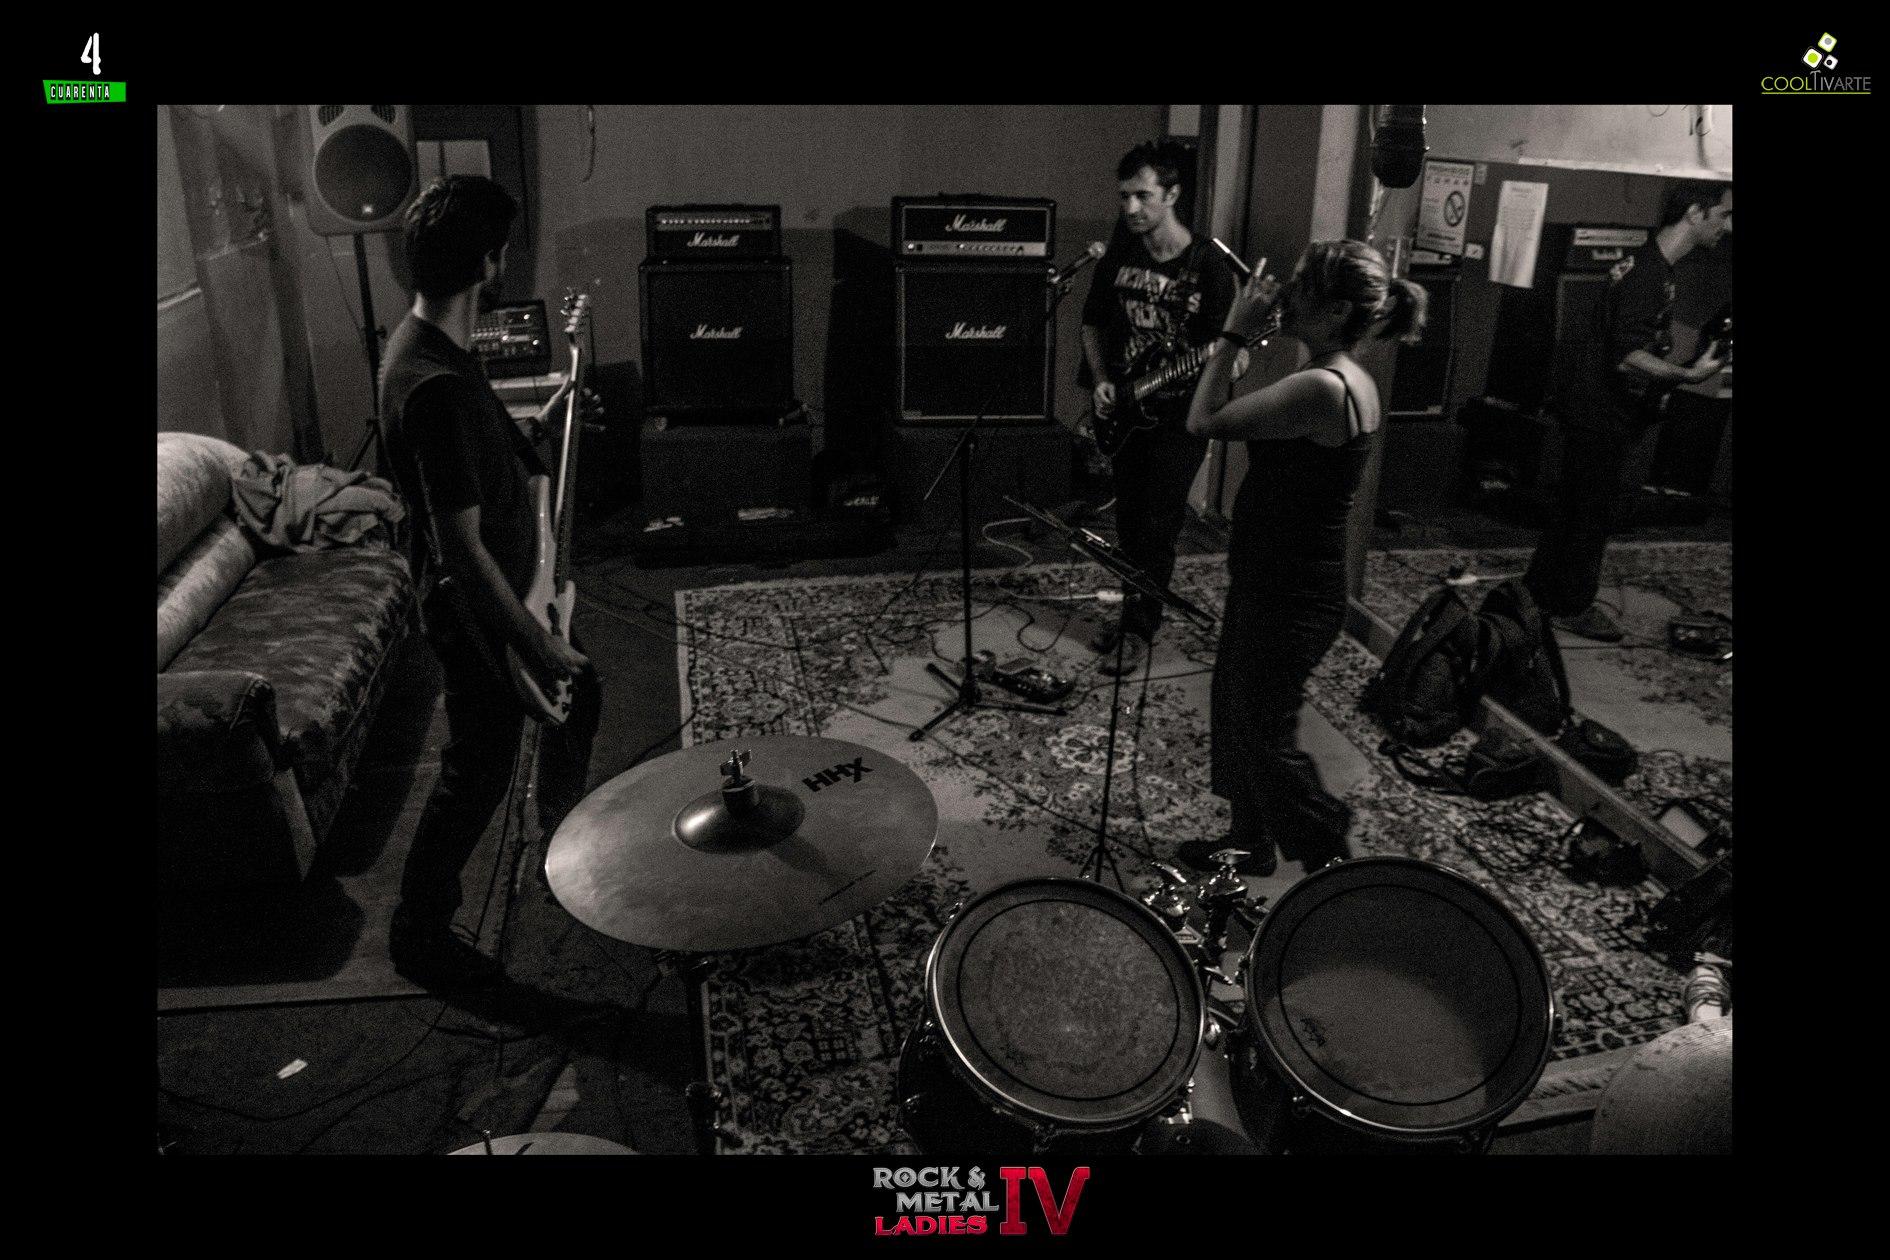 imagen - Rock & Metal Ladies IV de ensayo foto Javier Rivero